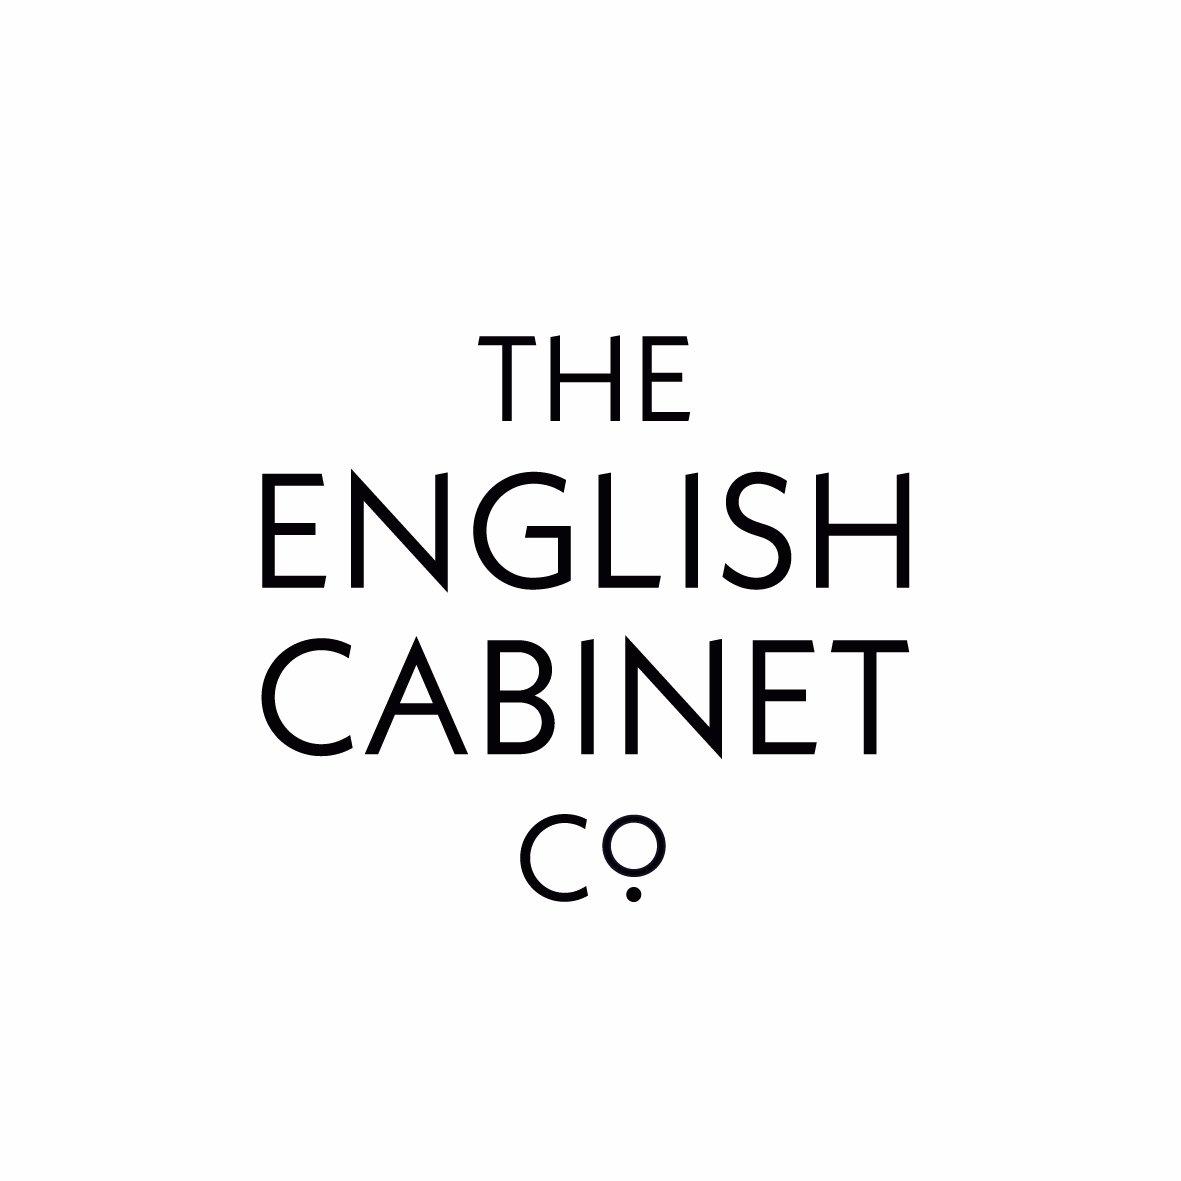 English Cabinet Co